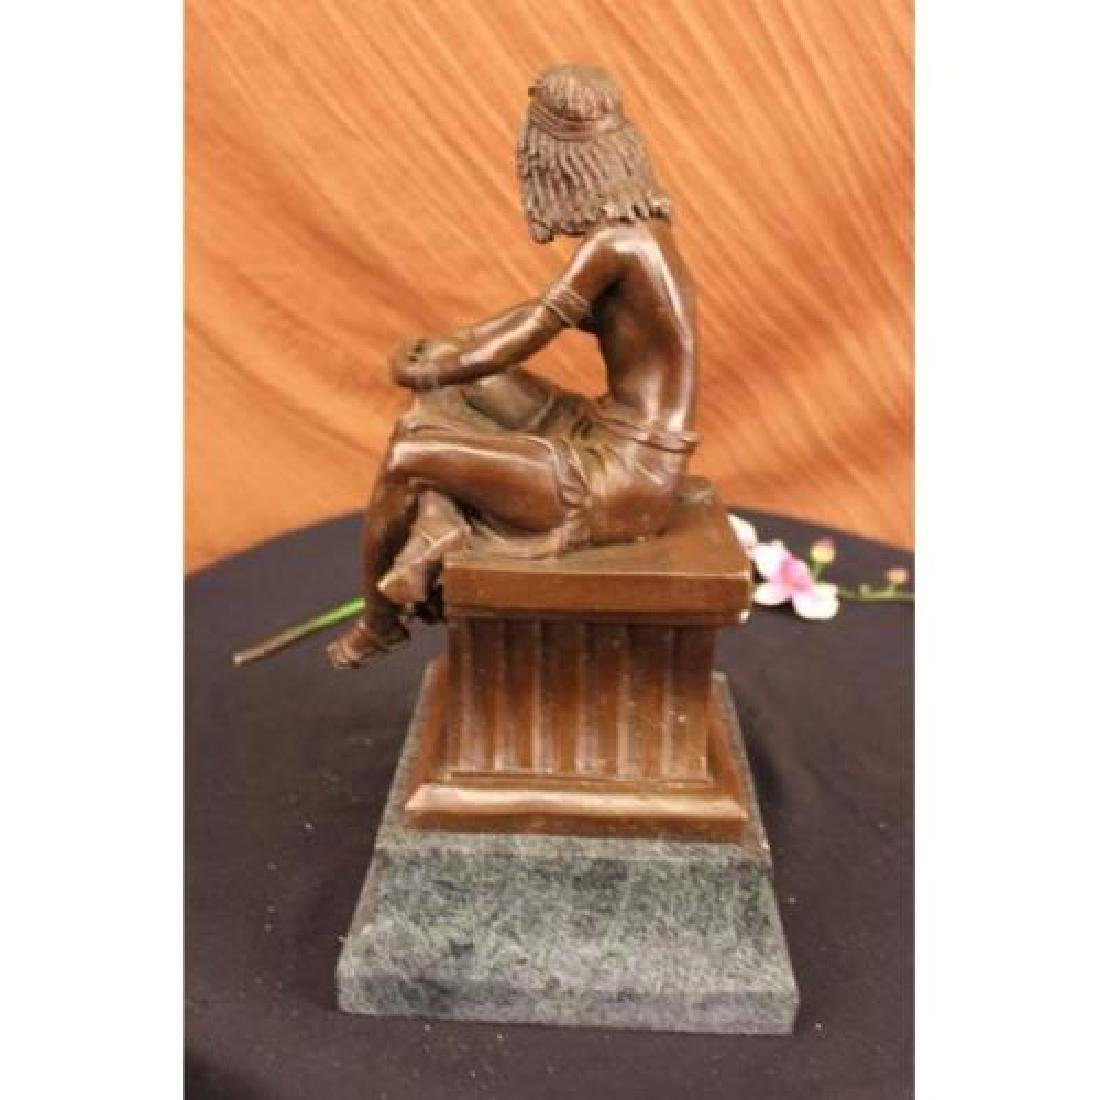 Sitting Egyptian Nude Princess Bronze Sculpture - 5